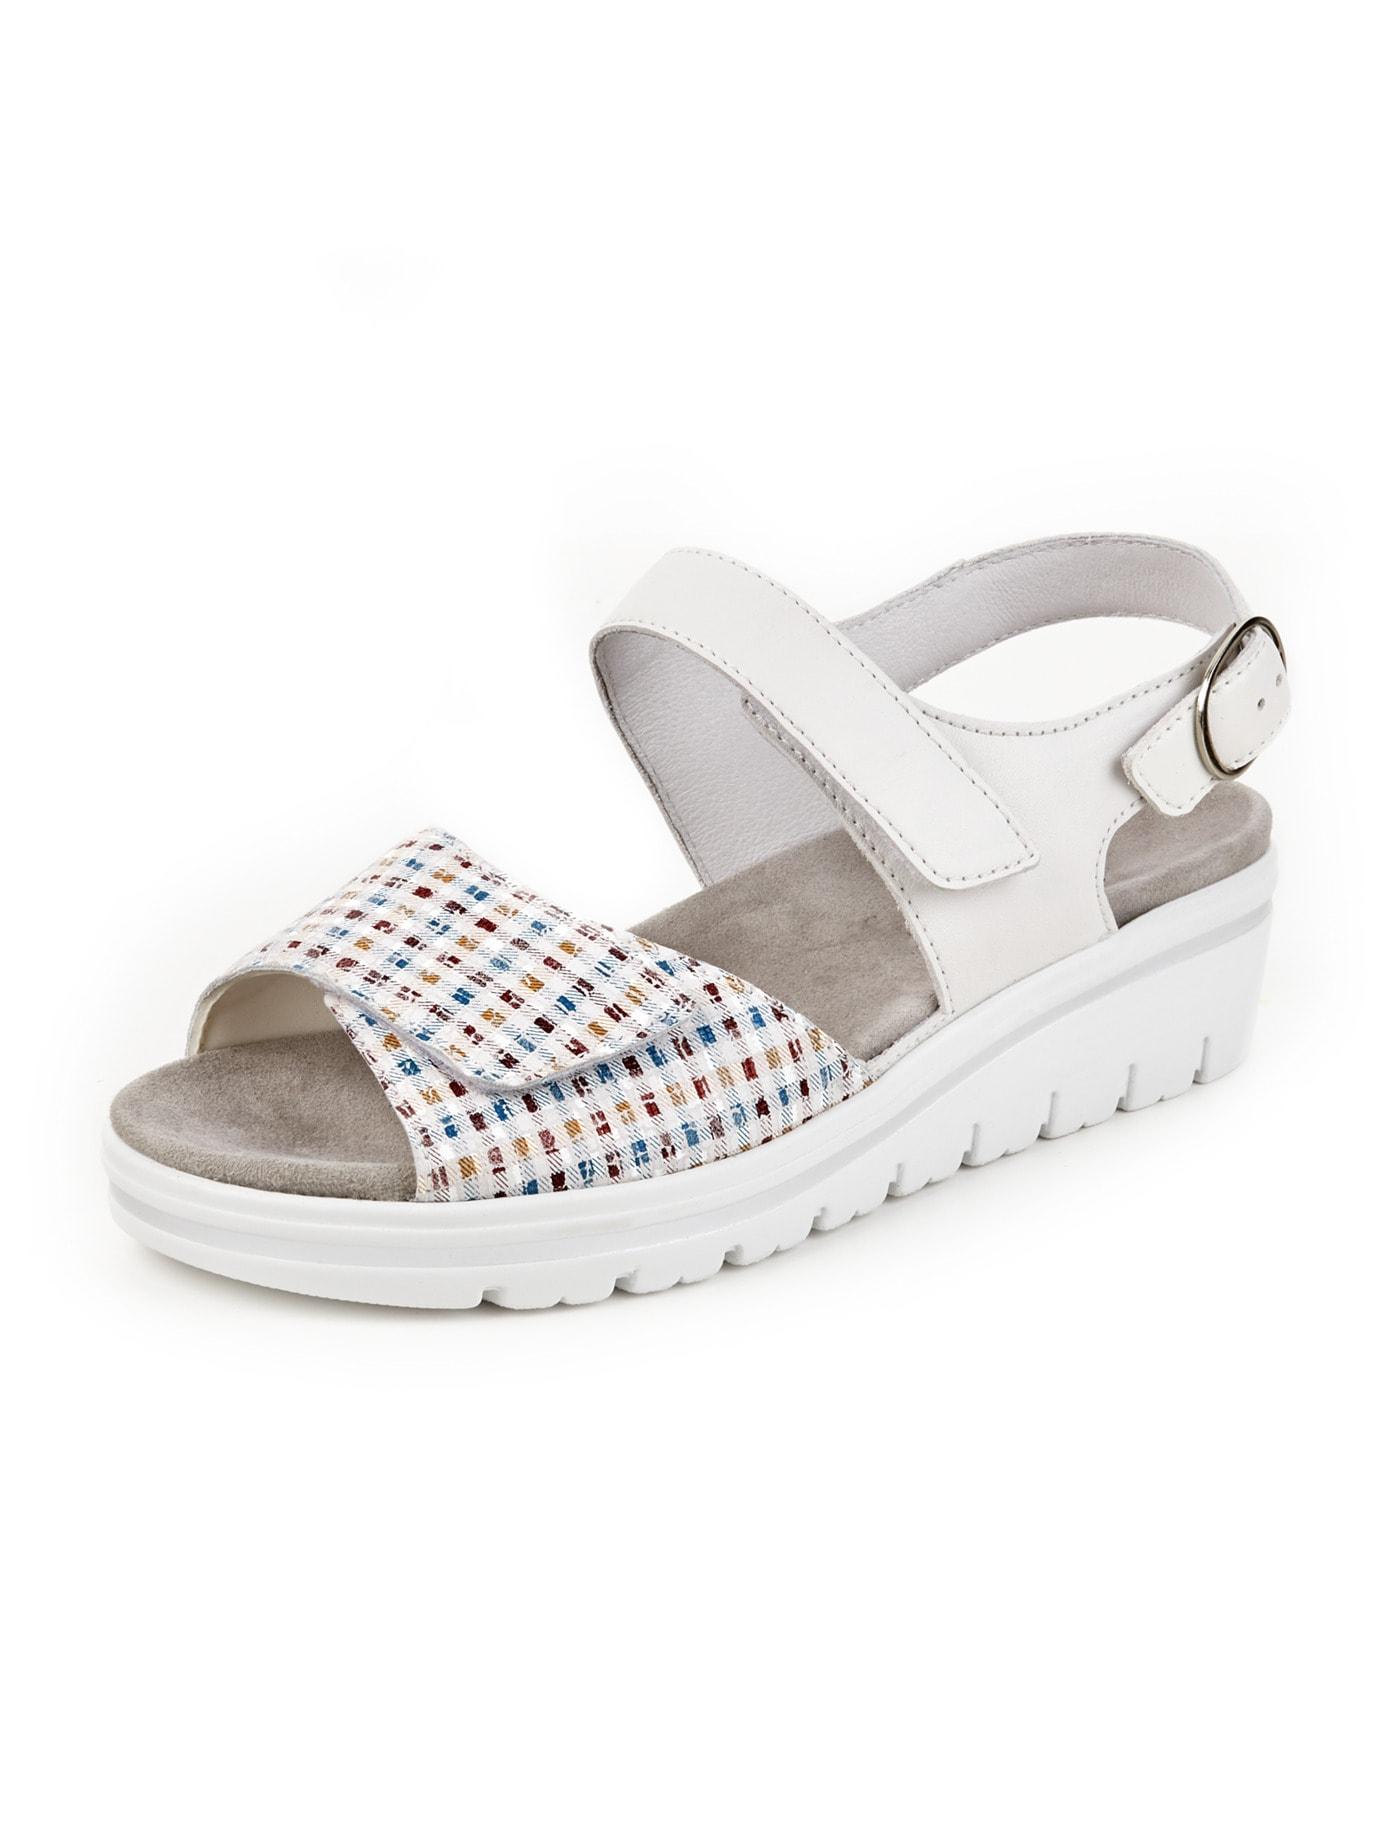 Avena Damen Hallux-Sandale de Luxe Weiss 45-7954-2